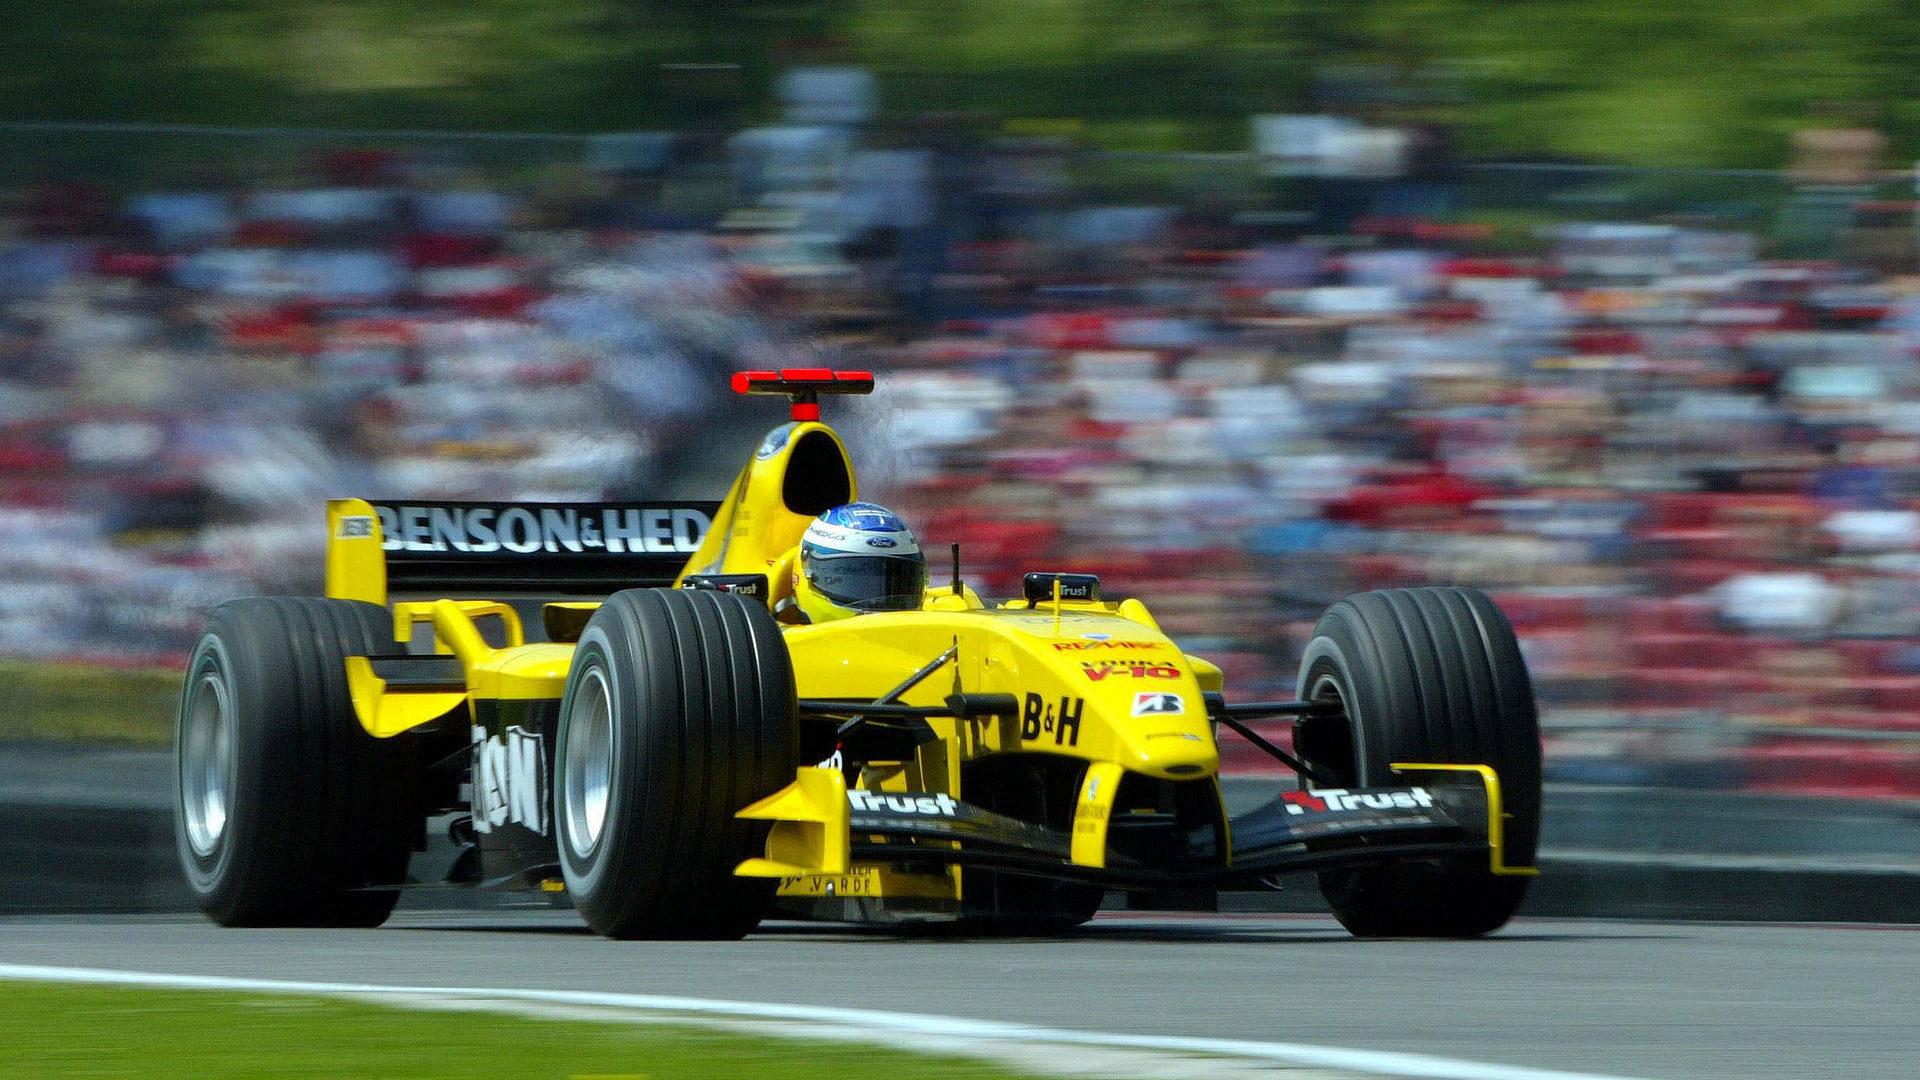 F1 Leclerc to Ferrari Confirmed Raikkonen to Sauber in